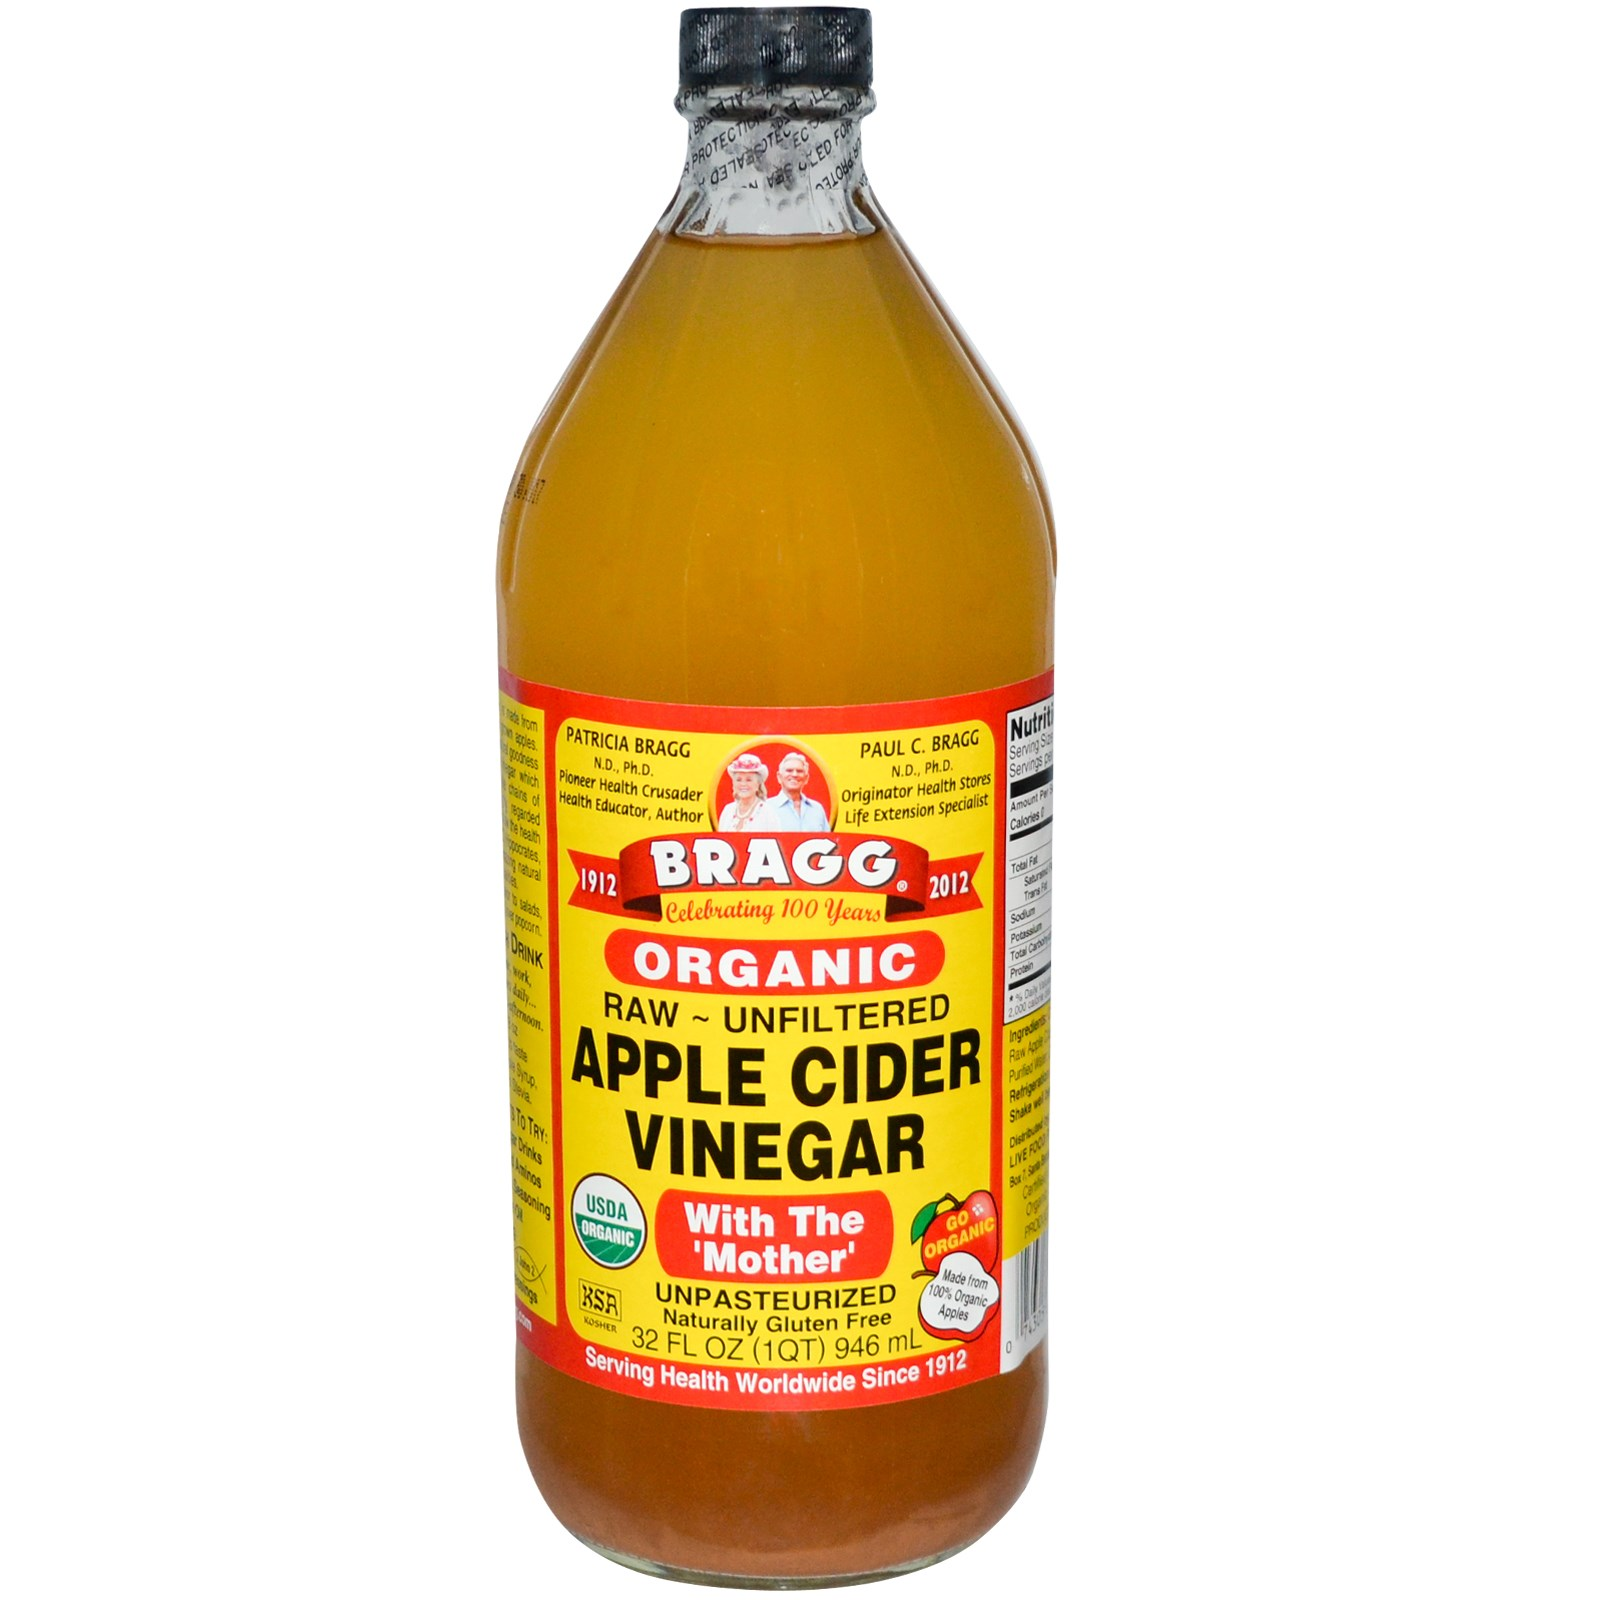 Braggs apple cider vinegar clipart.